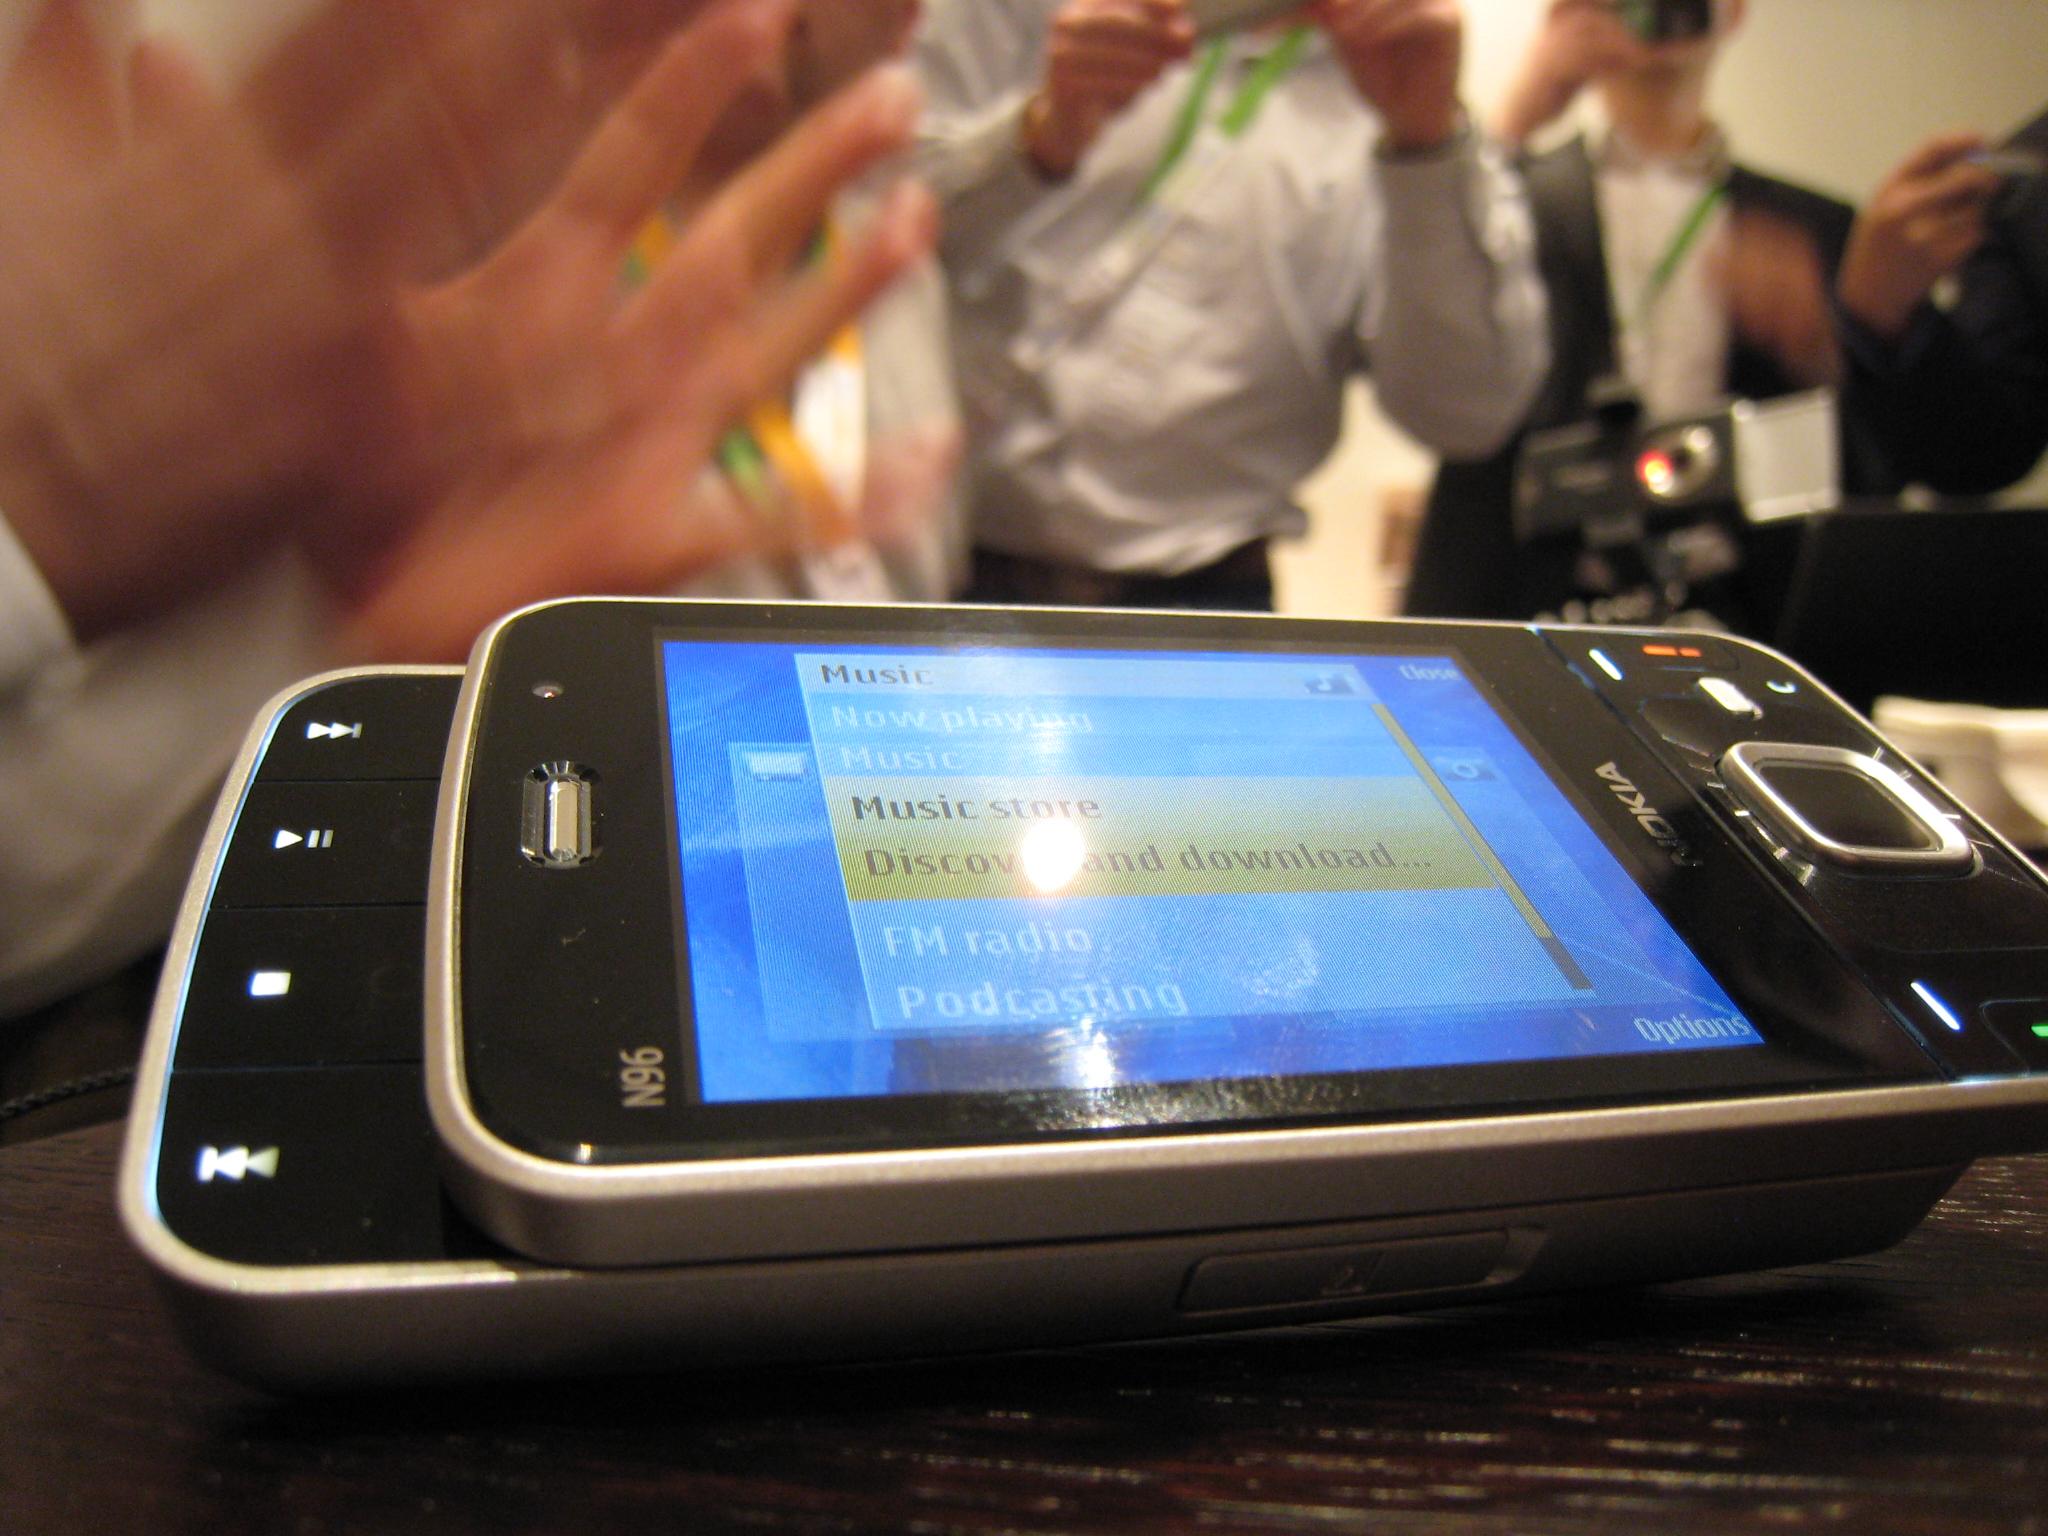 N96 | gsm2indonesia.